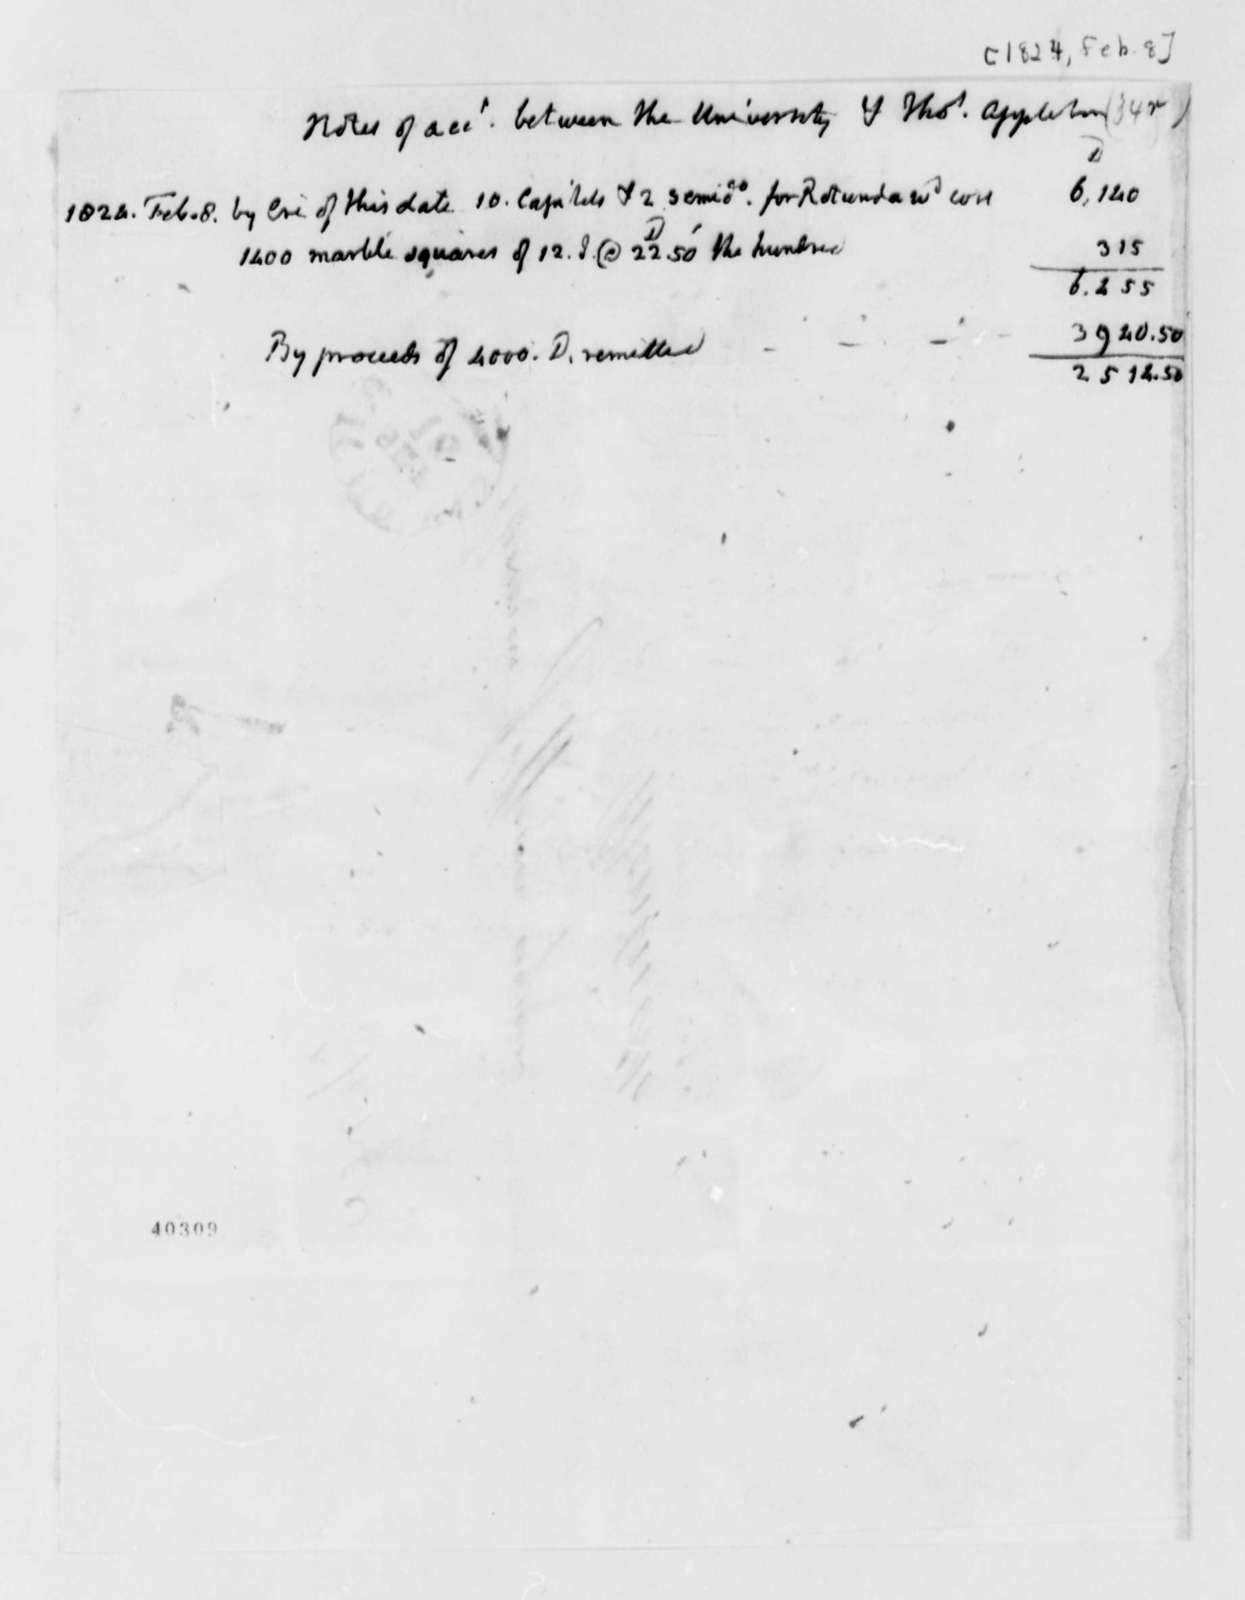 University of Virginia & Thomas Appleton, February 8, 1824, Account